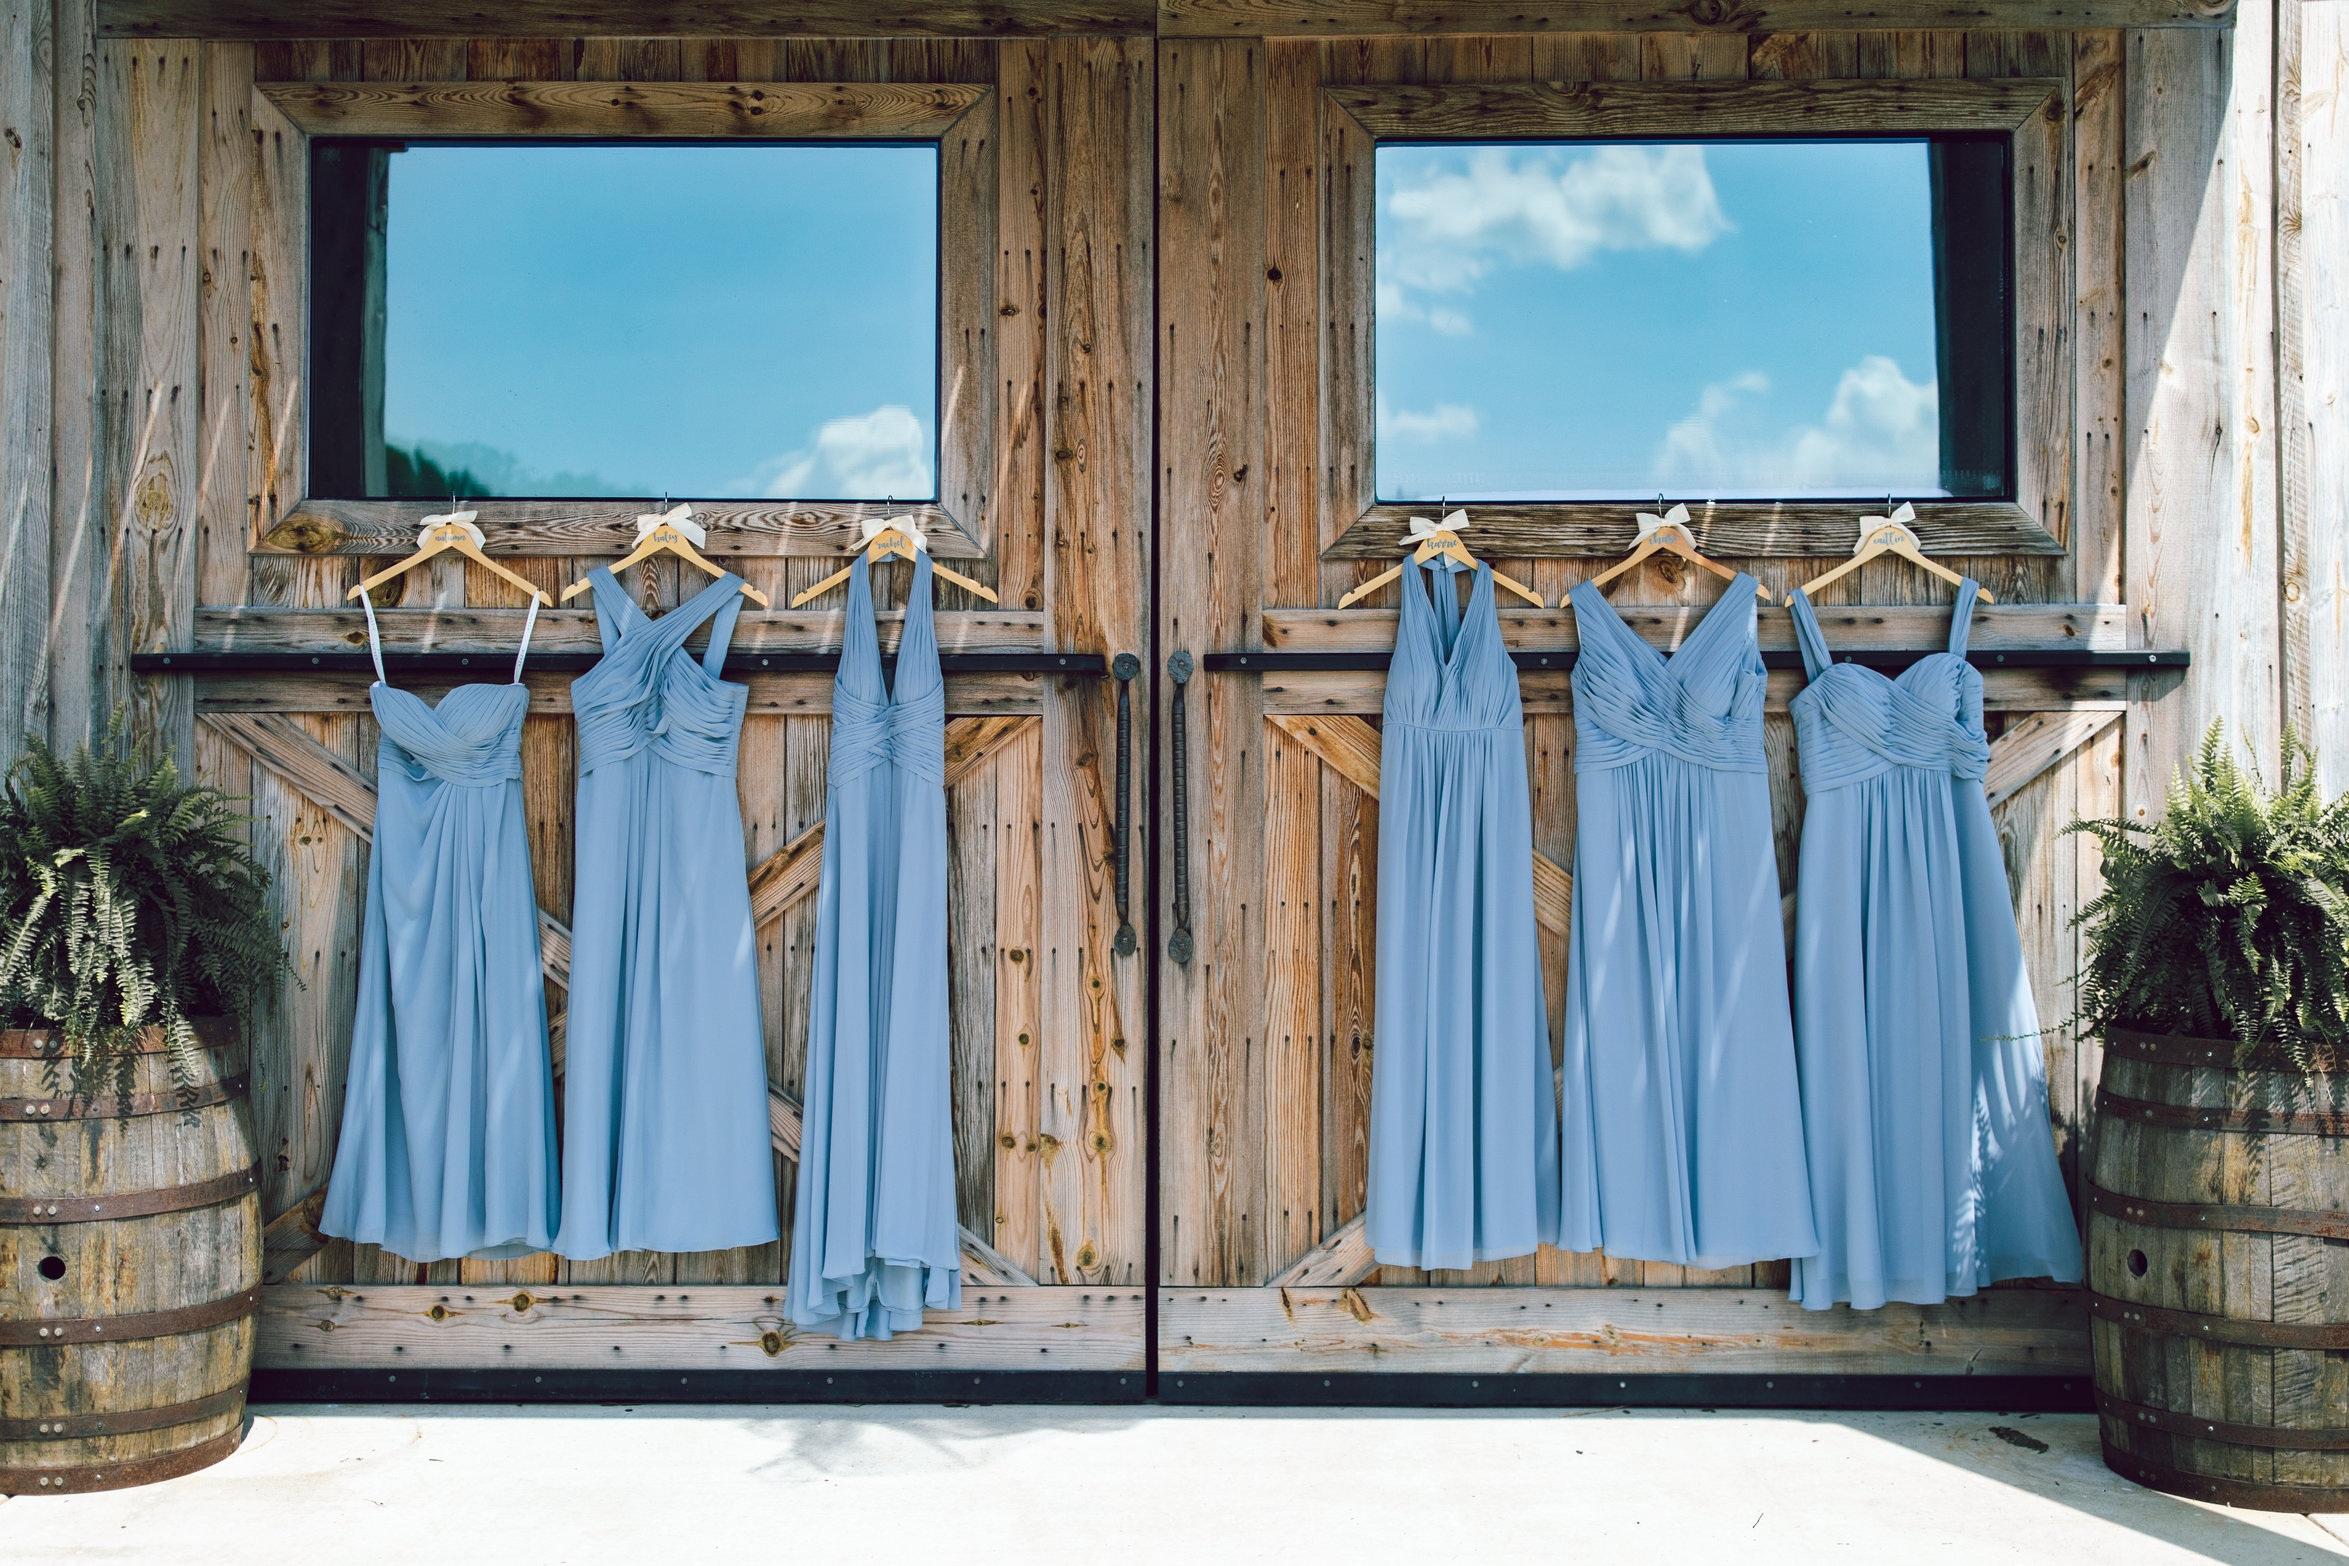 randi-schuette-photo-the-barn-at-heritage-farm-nc-wedding-edwards-details52.jpg